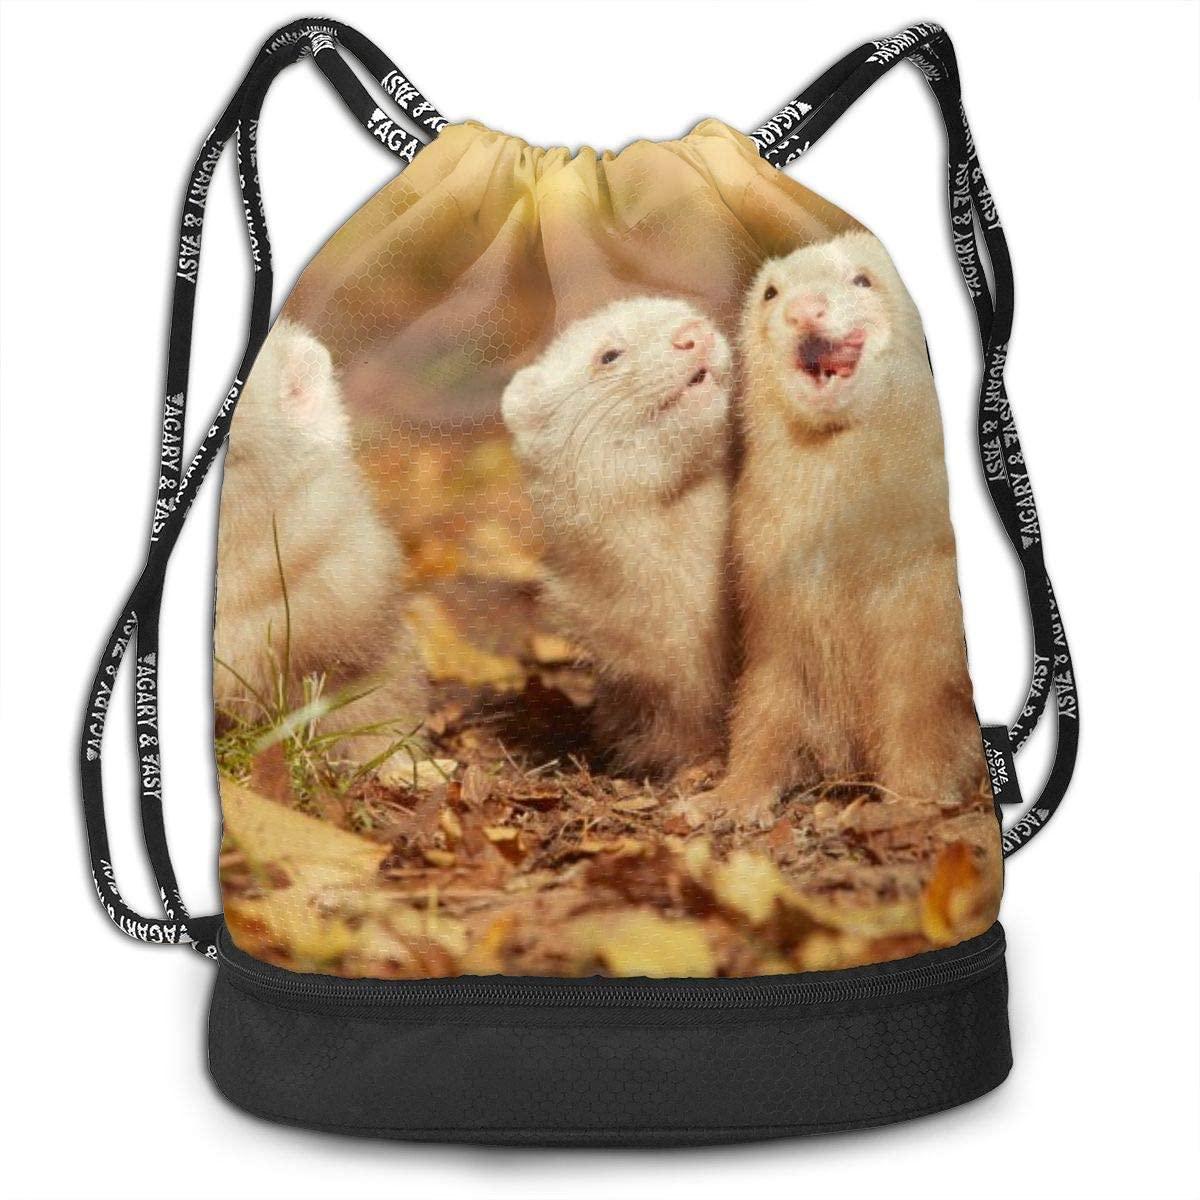 Bundle Backpacks Ferret Group Gym Sack Drawstring Bags Casual Daypack Yoga Bag School Training Pouch